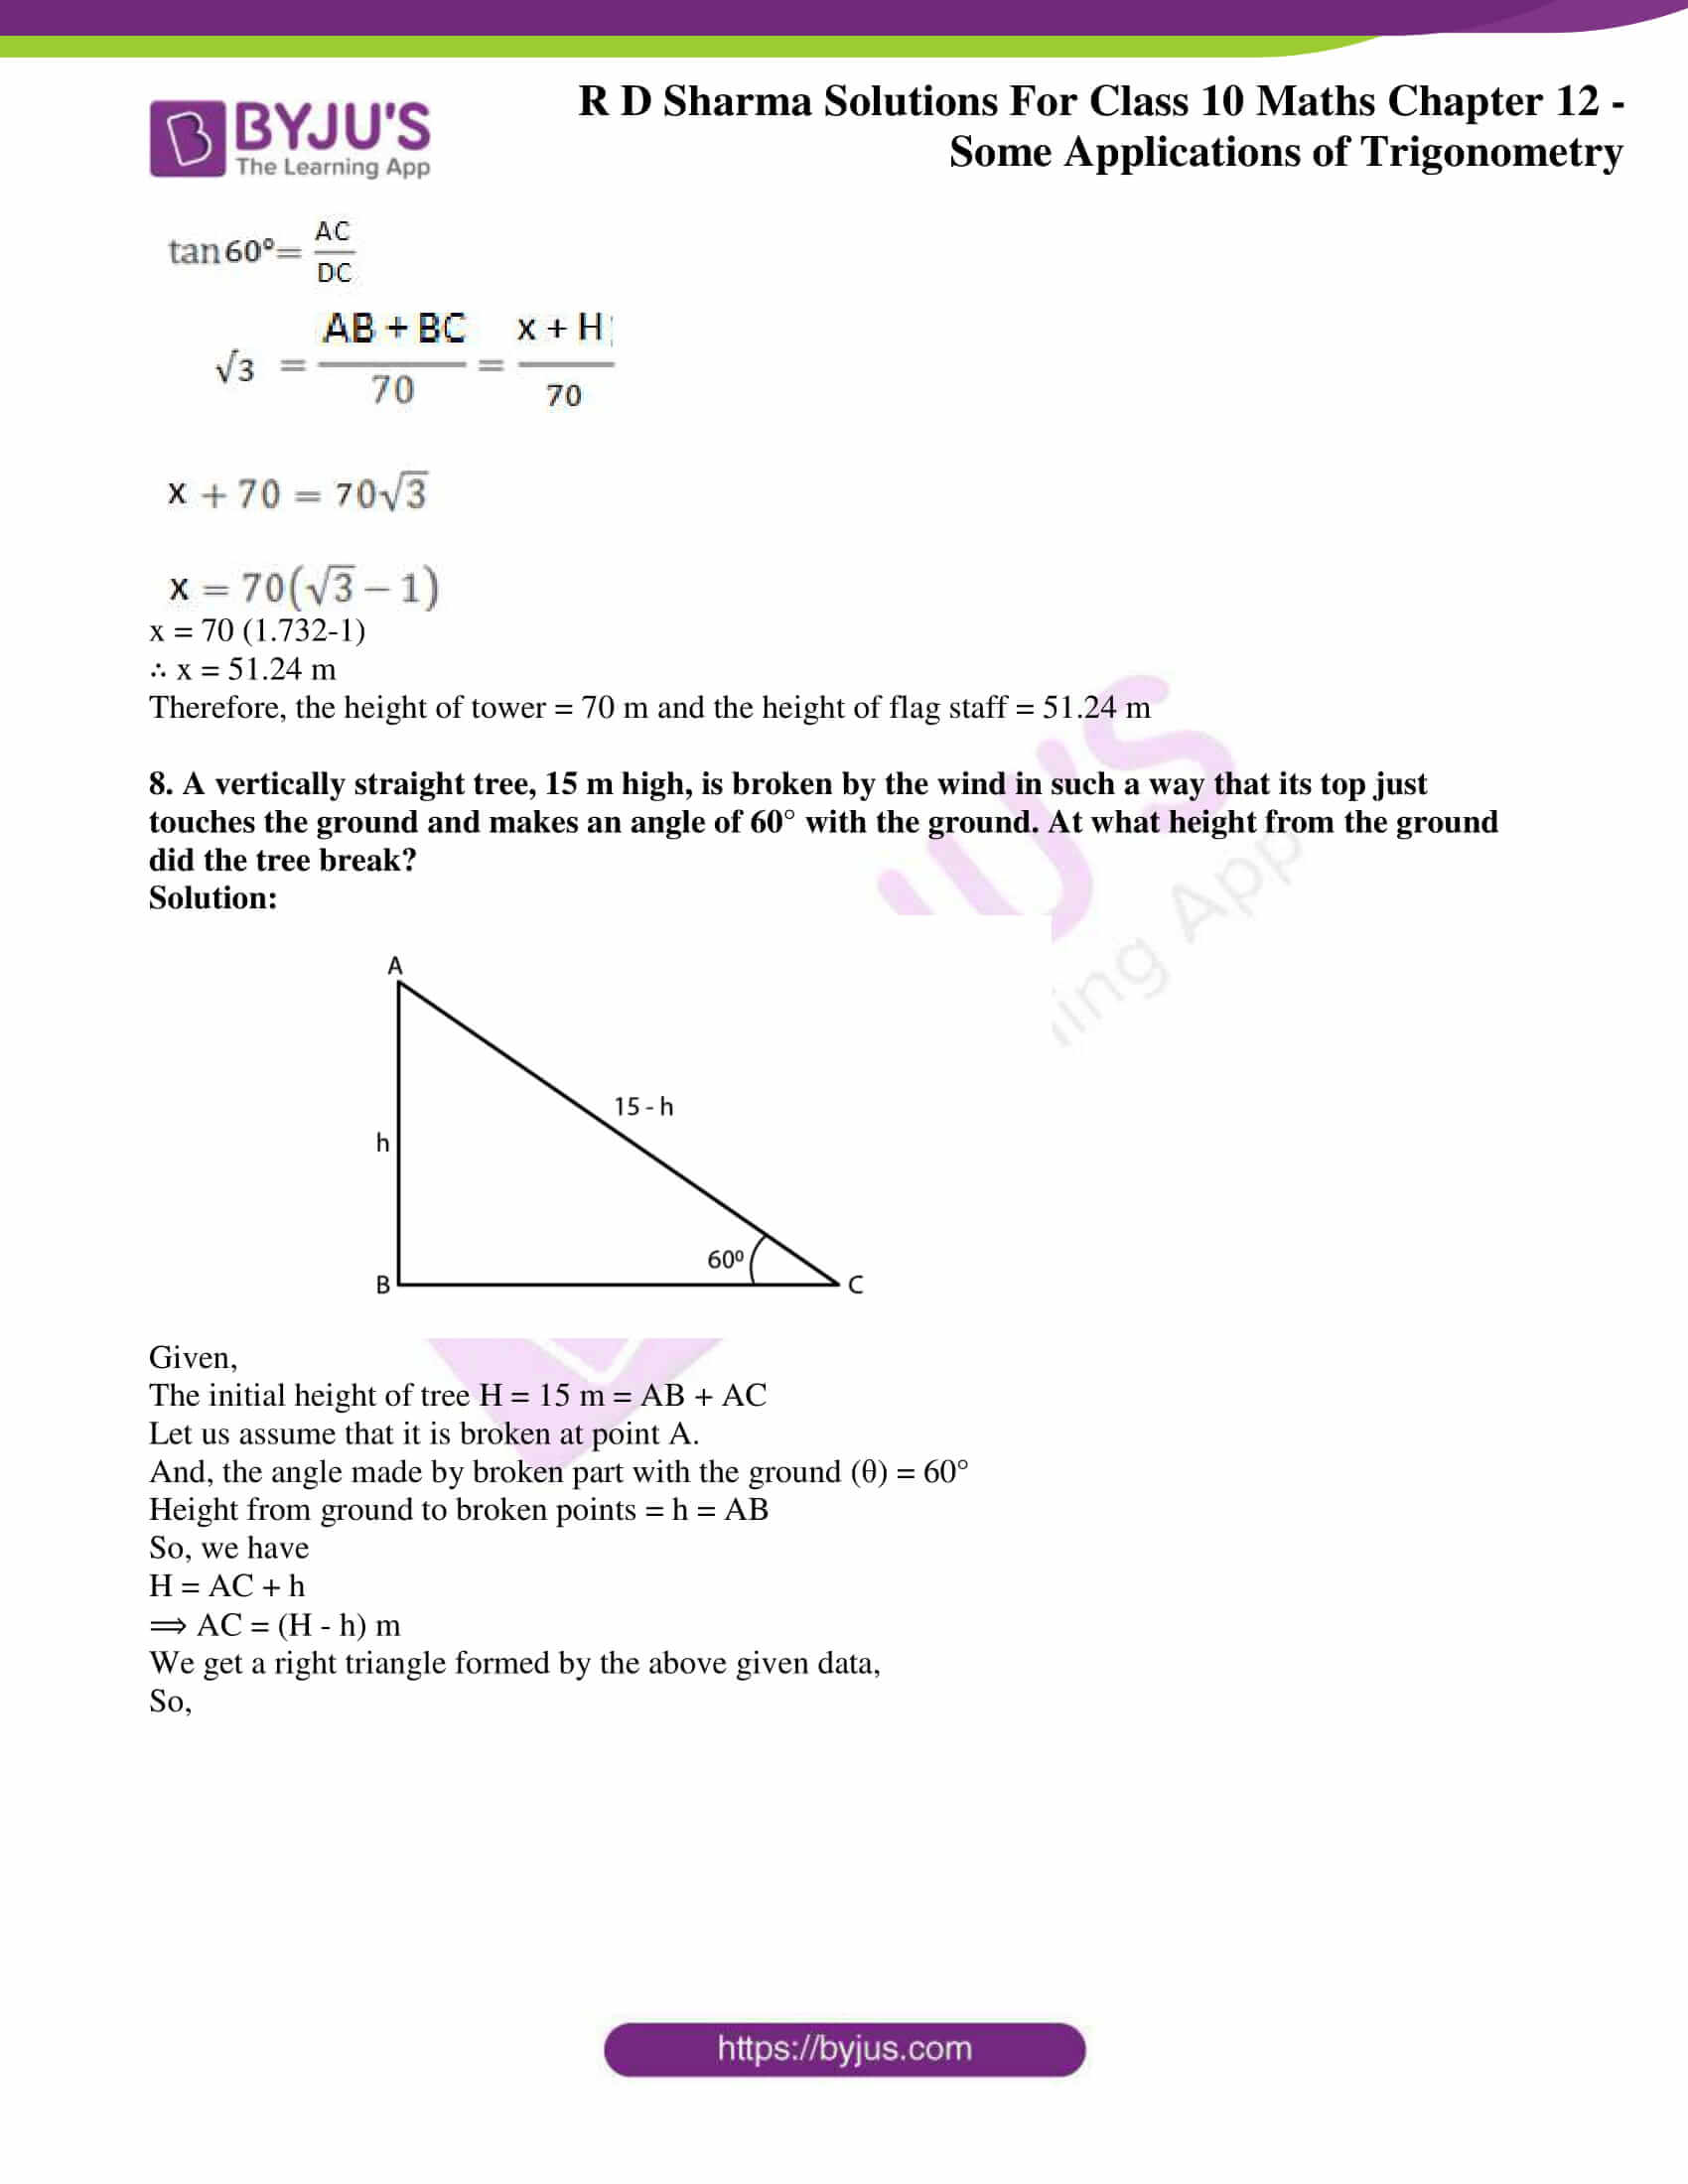 rd sharma class 10 chapter 12 applications trigonometry solutions 06